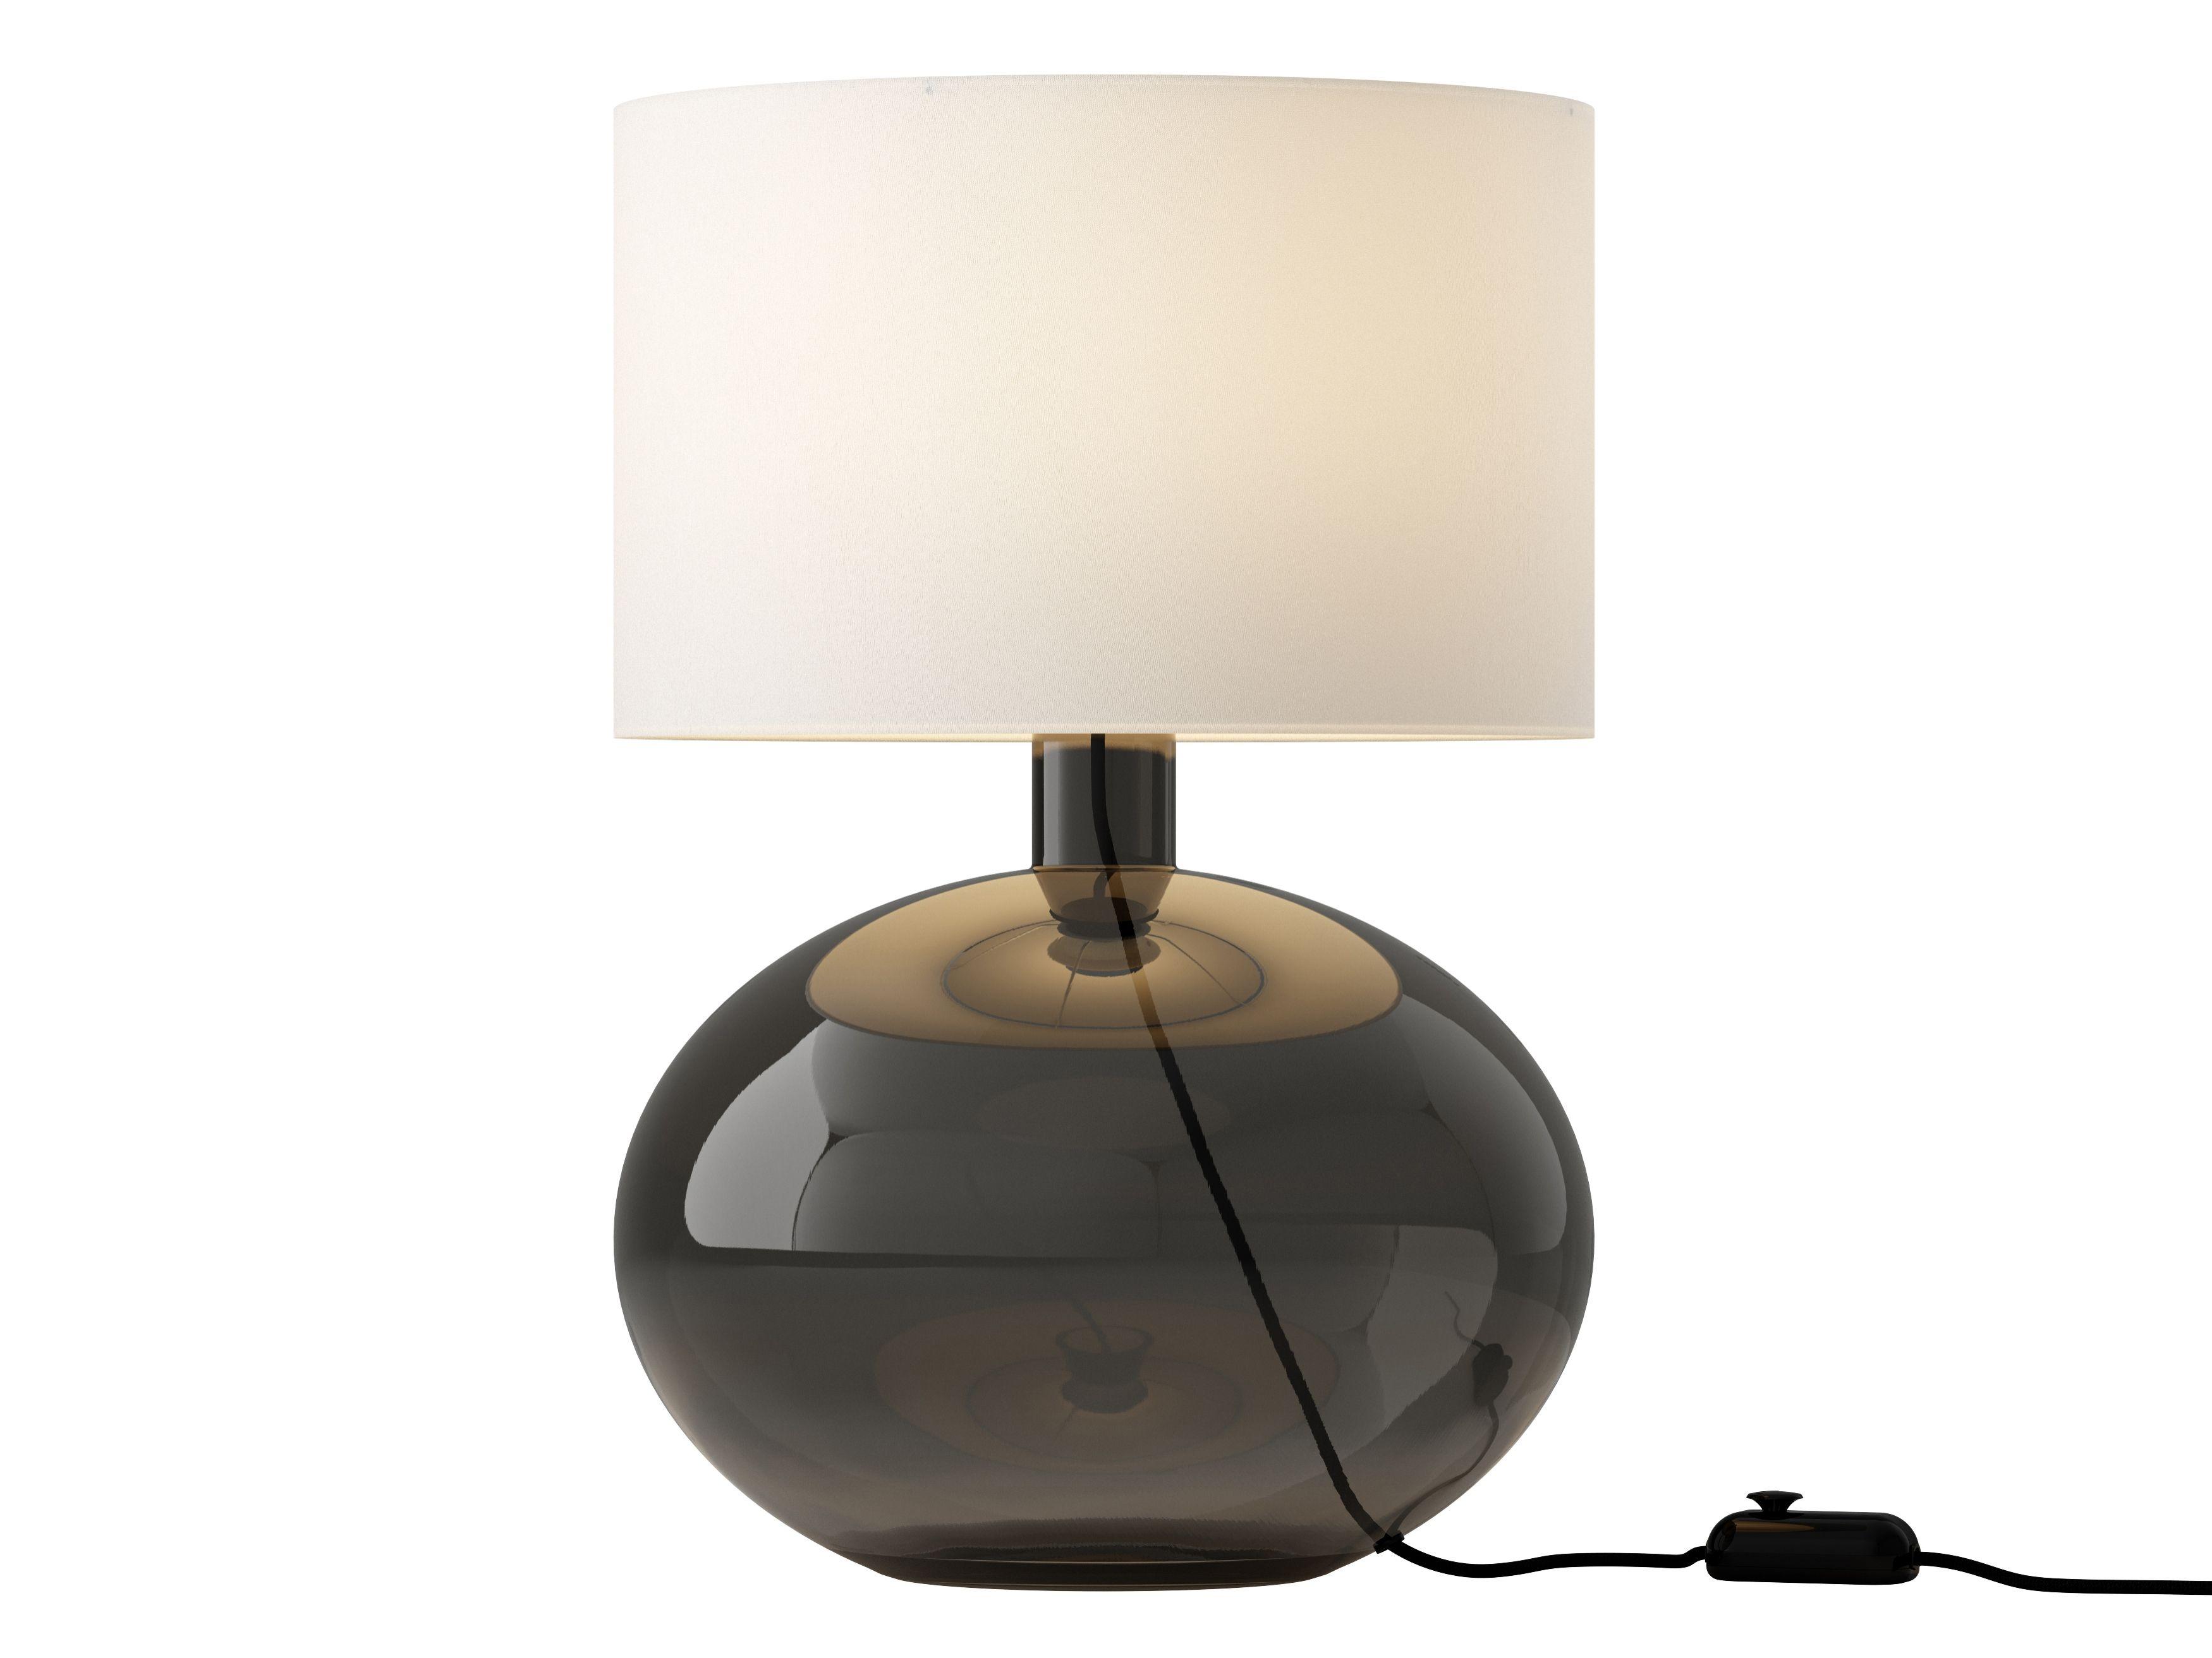 lighting ikea usa. Ikea Lighting Usa. Aydınlatma: Sizi Aydınlatacak öneriler Usa A N